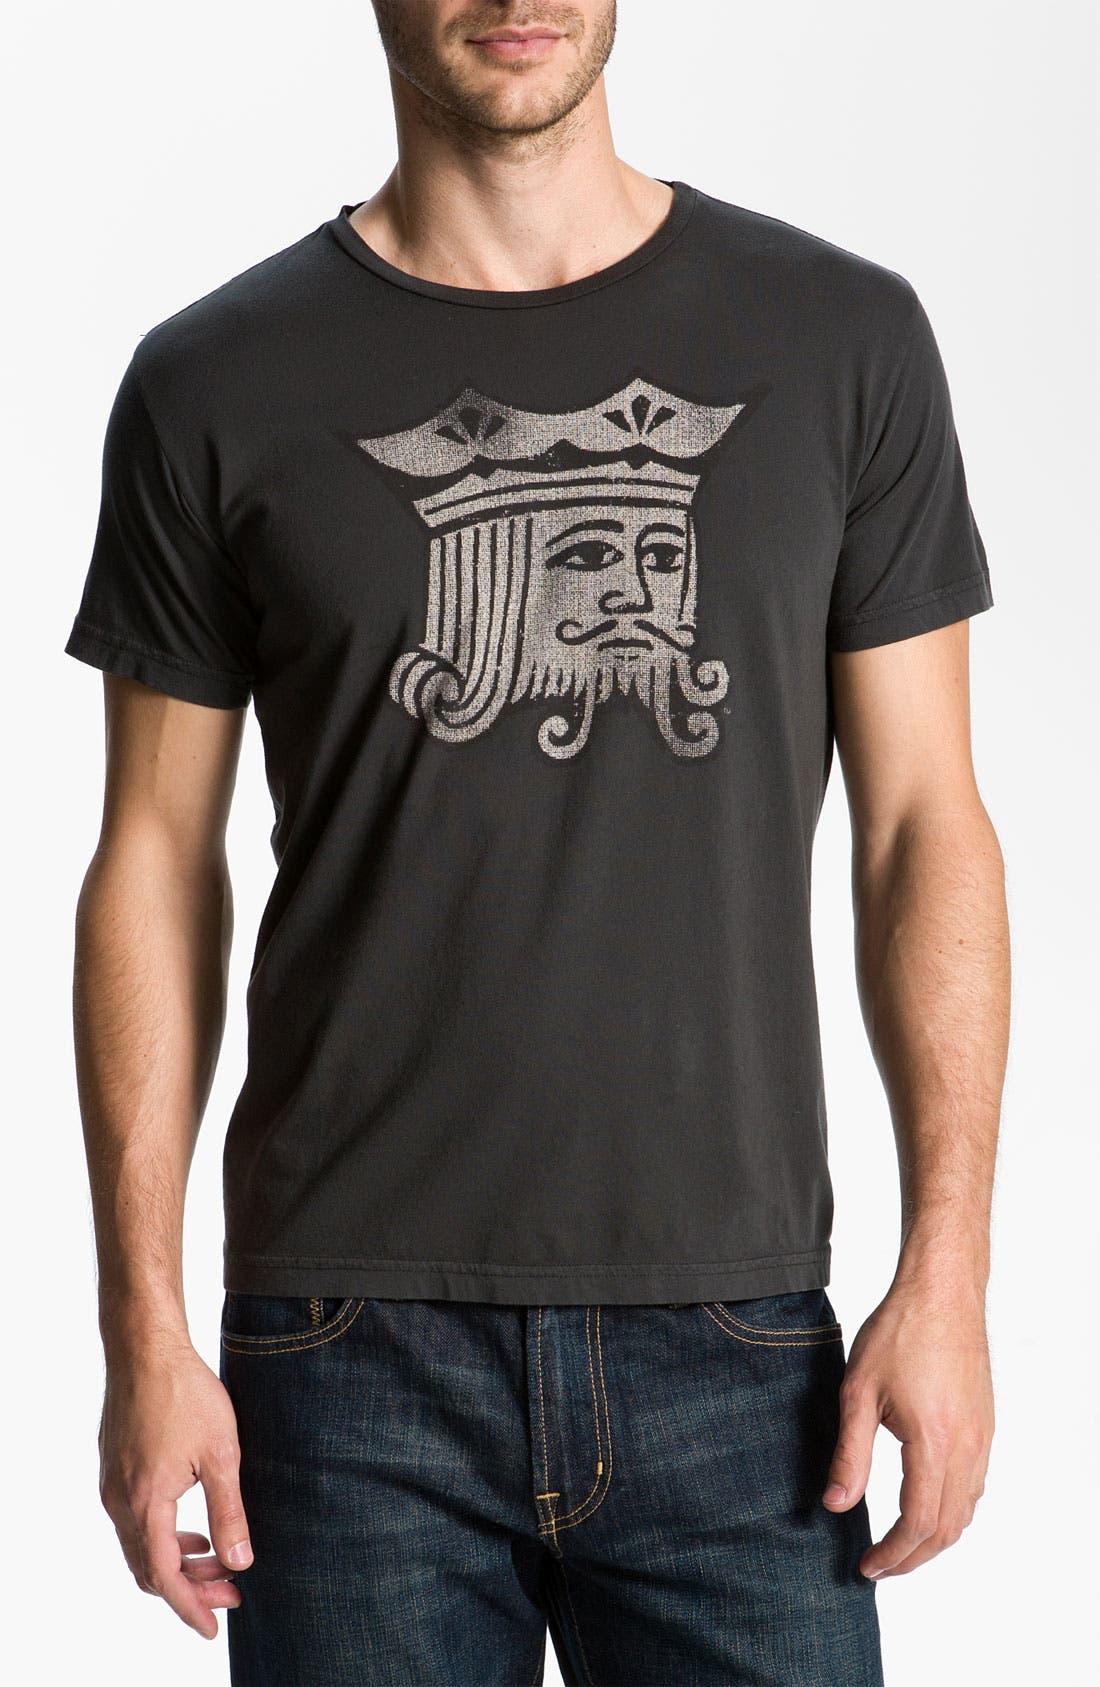 Main Image - Jacks & Jokers 'Kingshead' T-Shirt